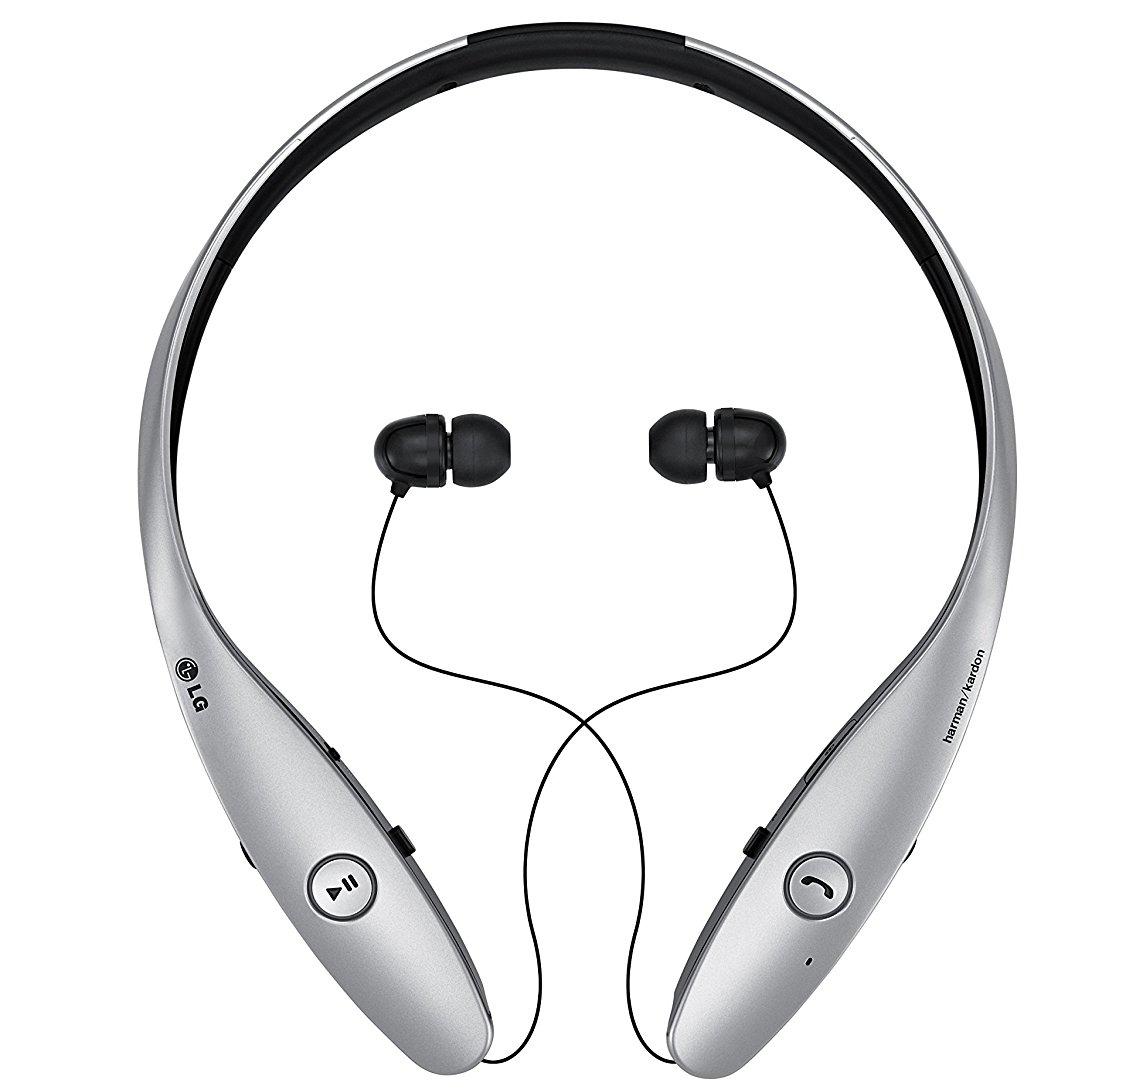 LG Tone Infinim cables